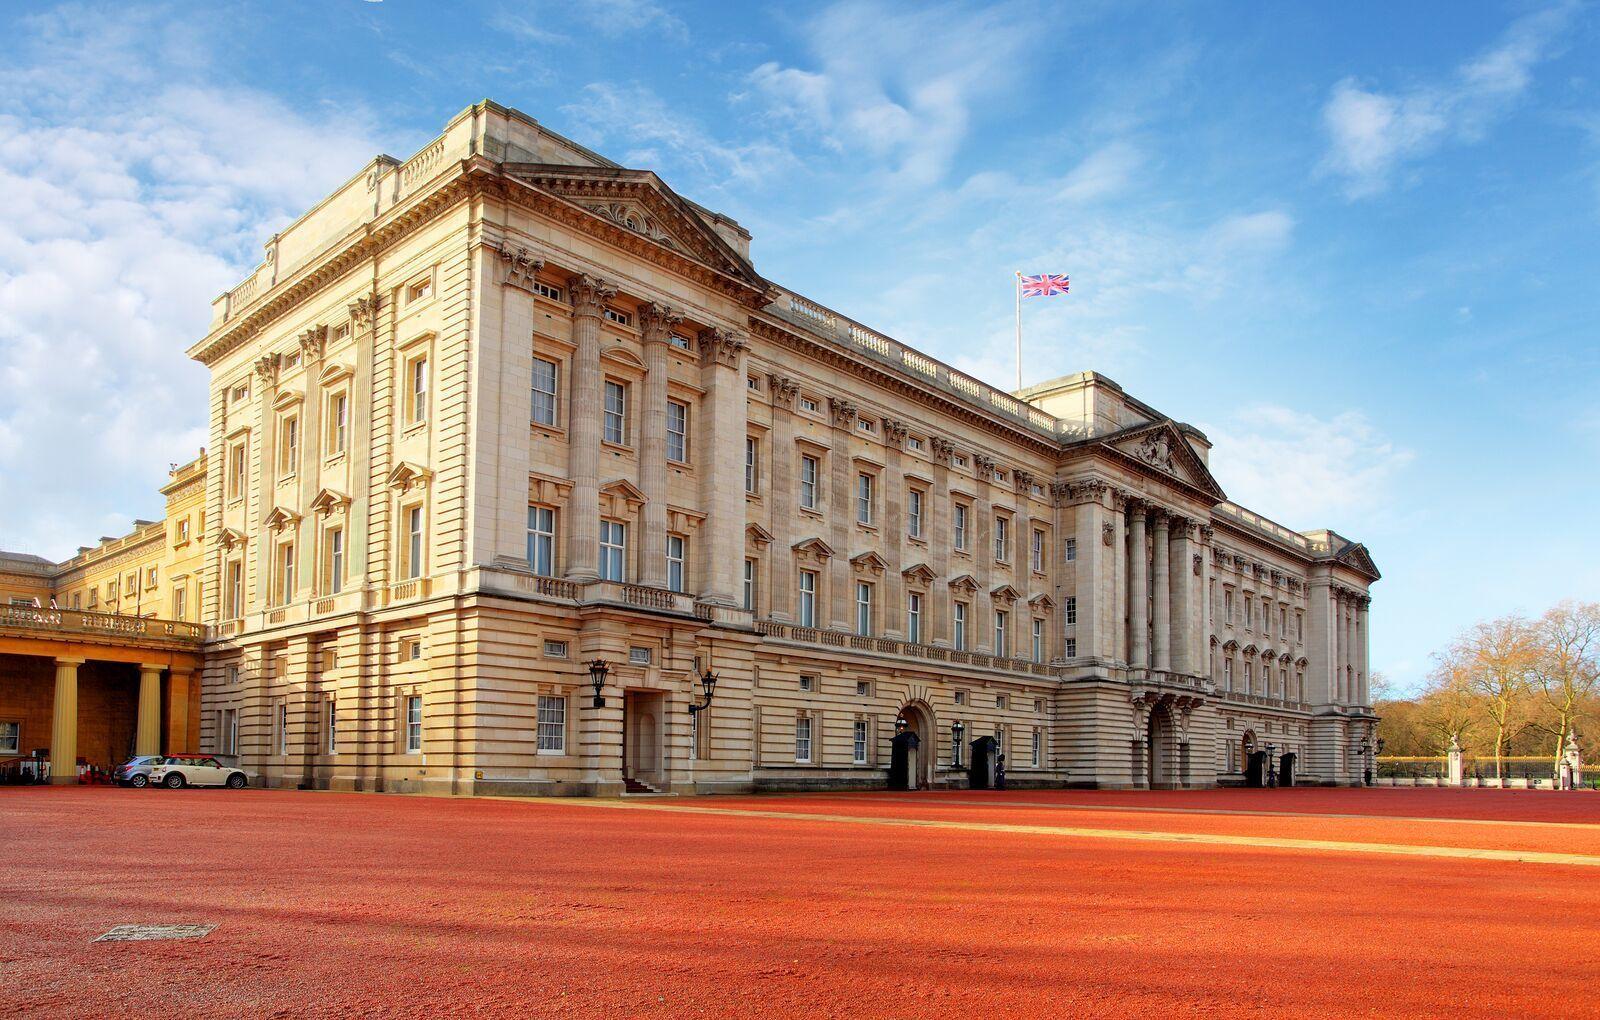 bigstock-London--Jan---Buckingham-P-61043792_preview.jpeg